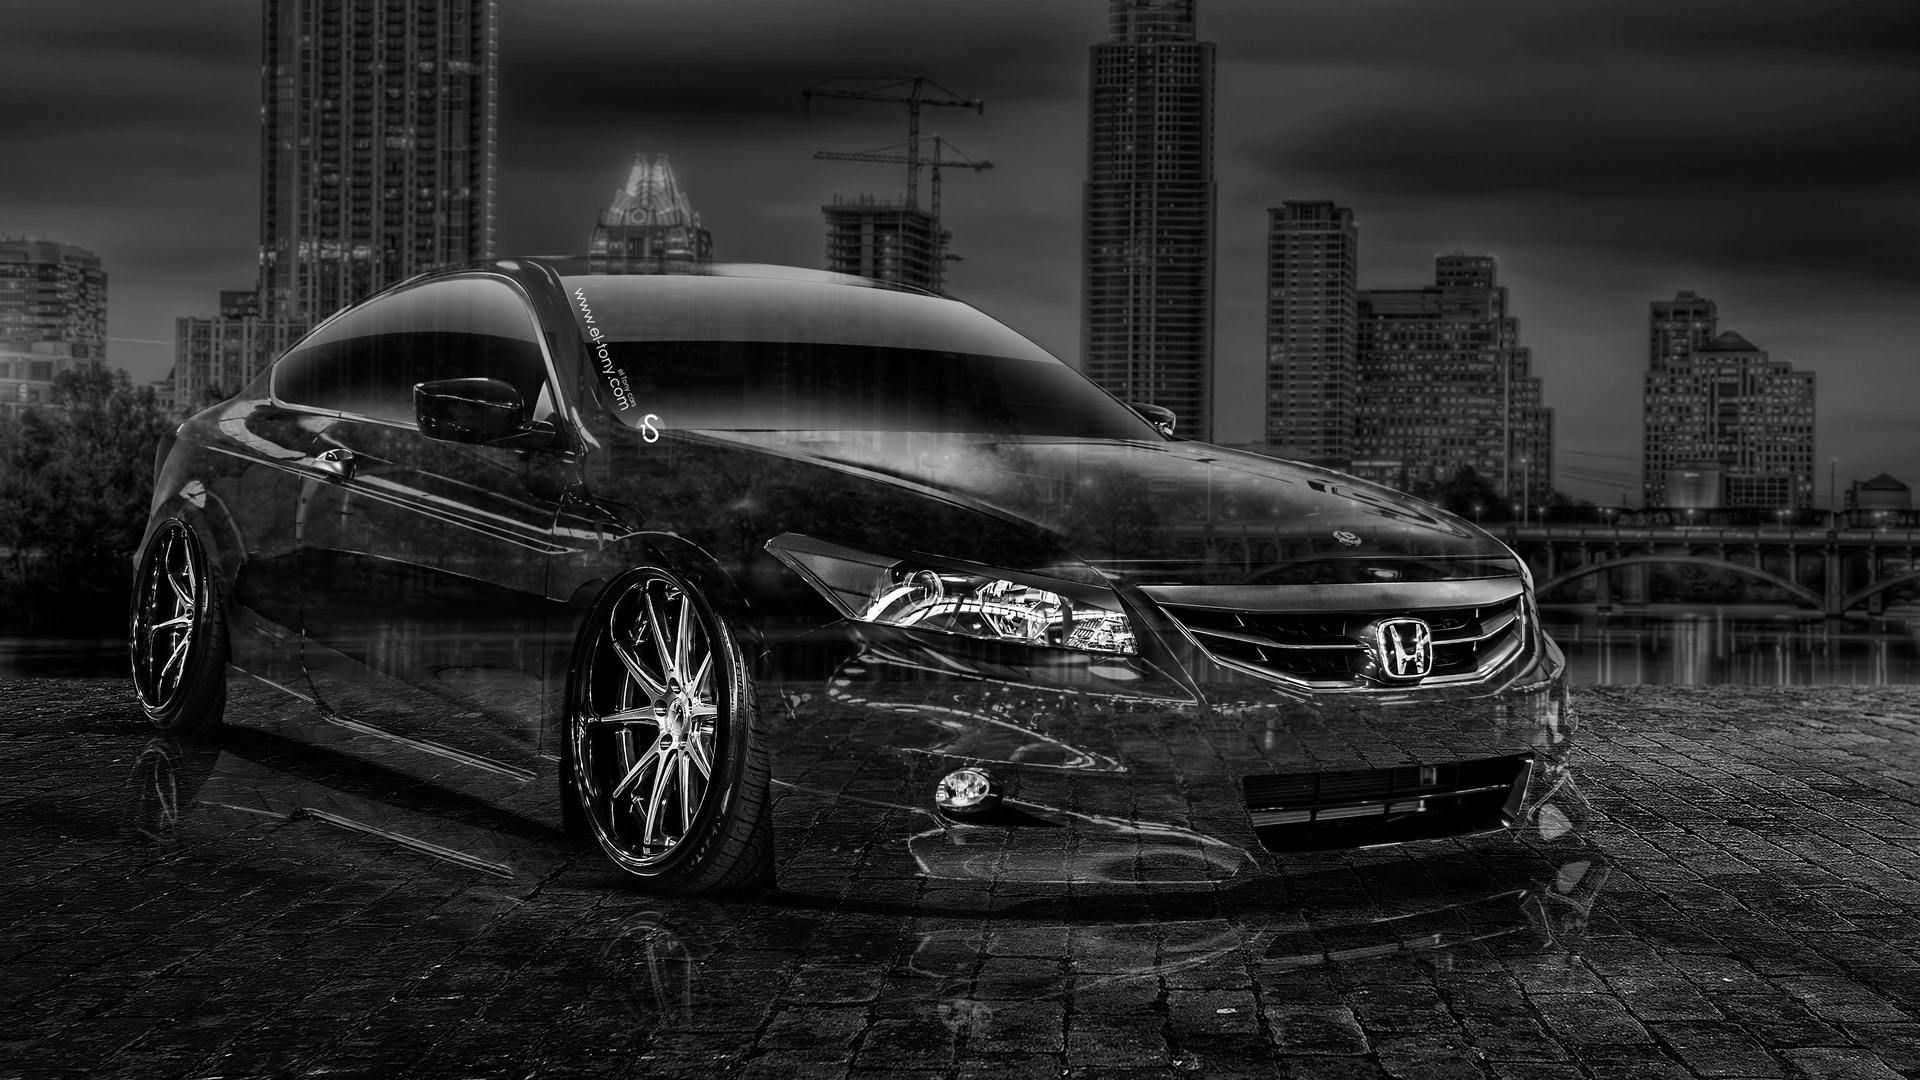 Black Honda Accord Wallpaper Hd Honda Get Free Image About